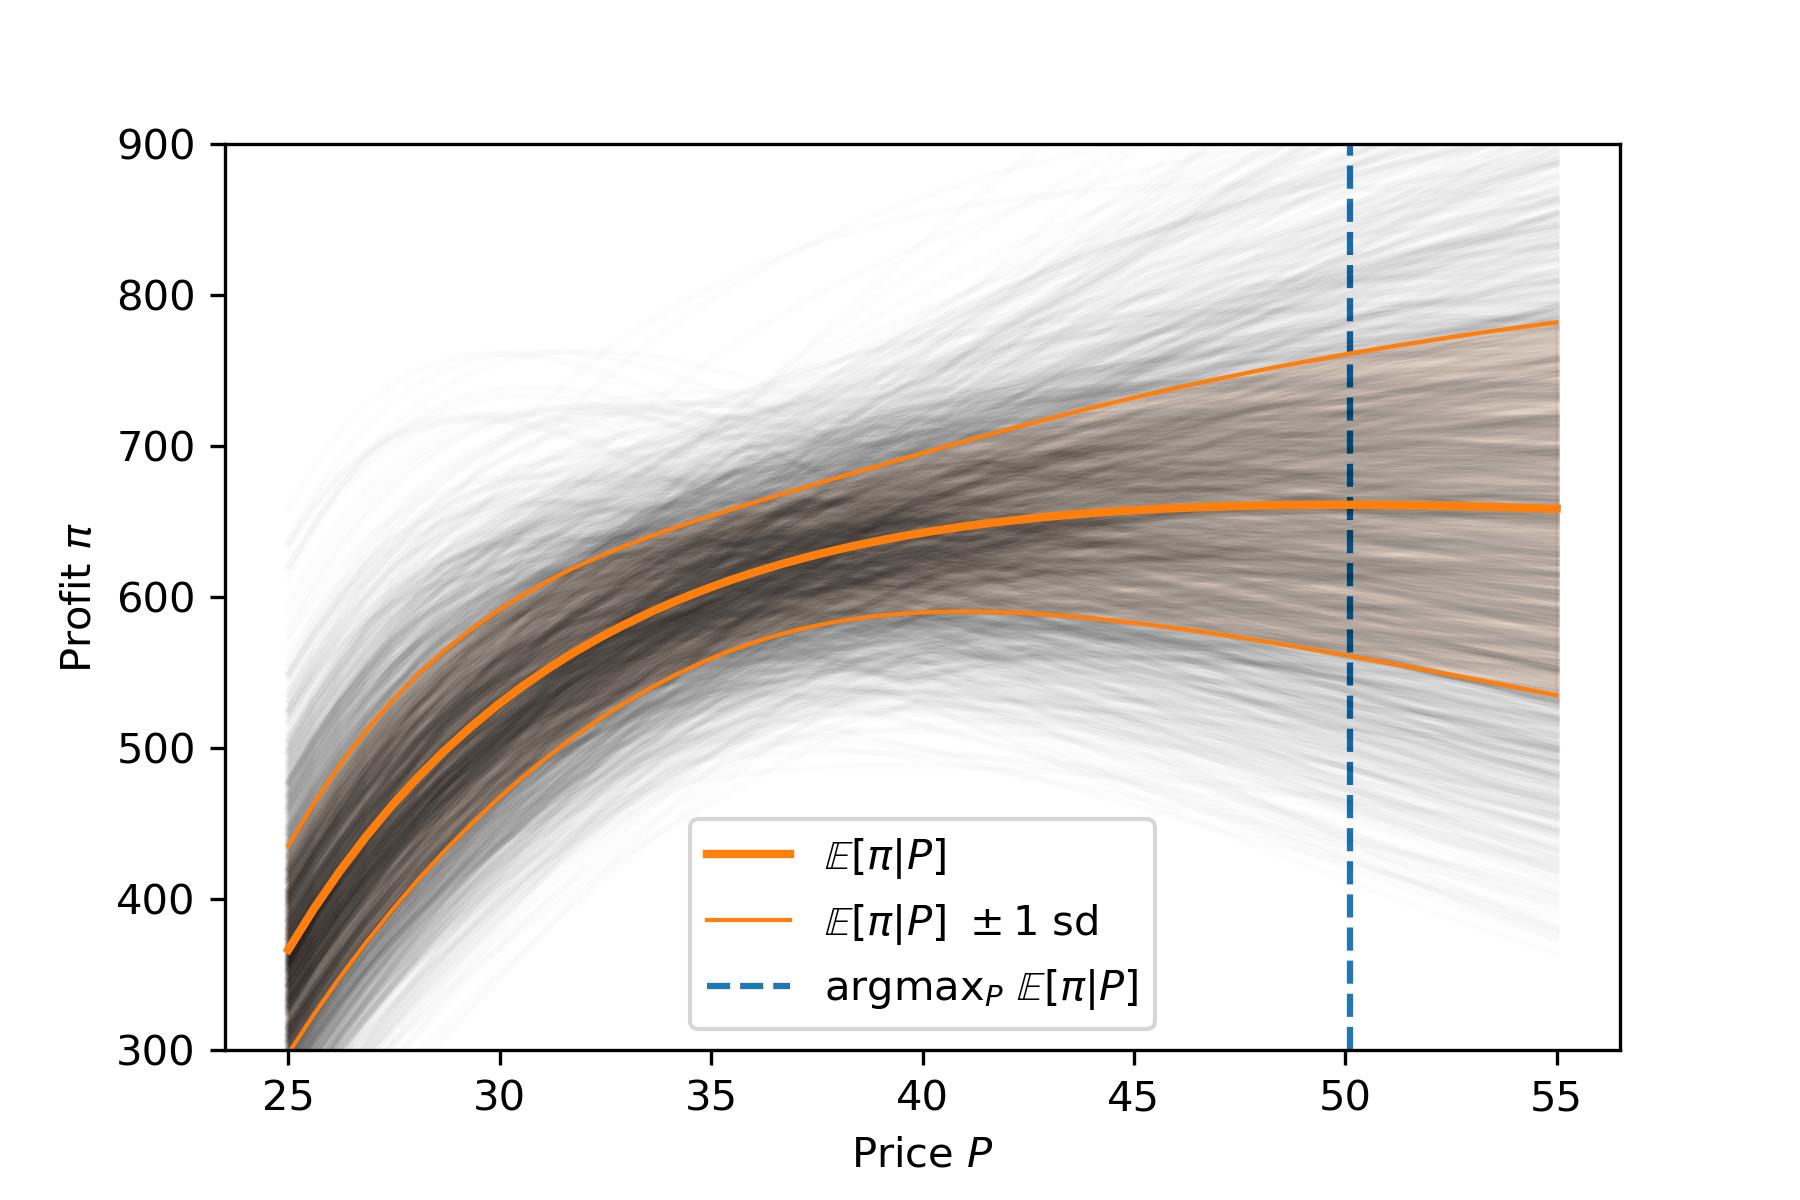 Bayesian Optimal Pricing, Part 1 - Chad Scherrer